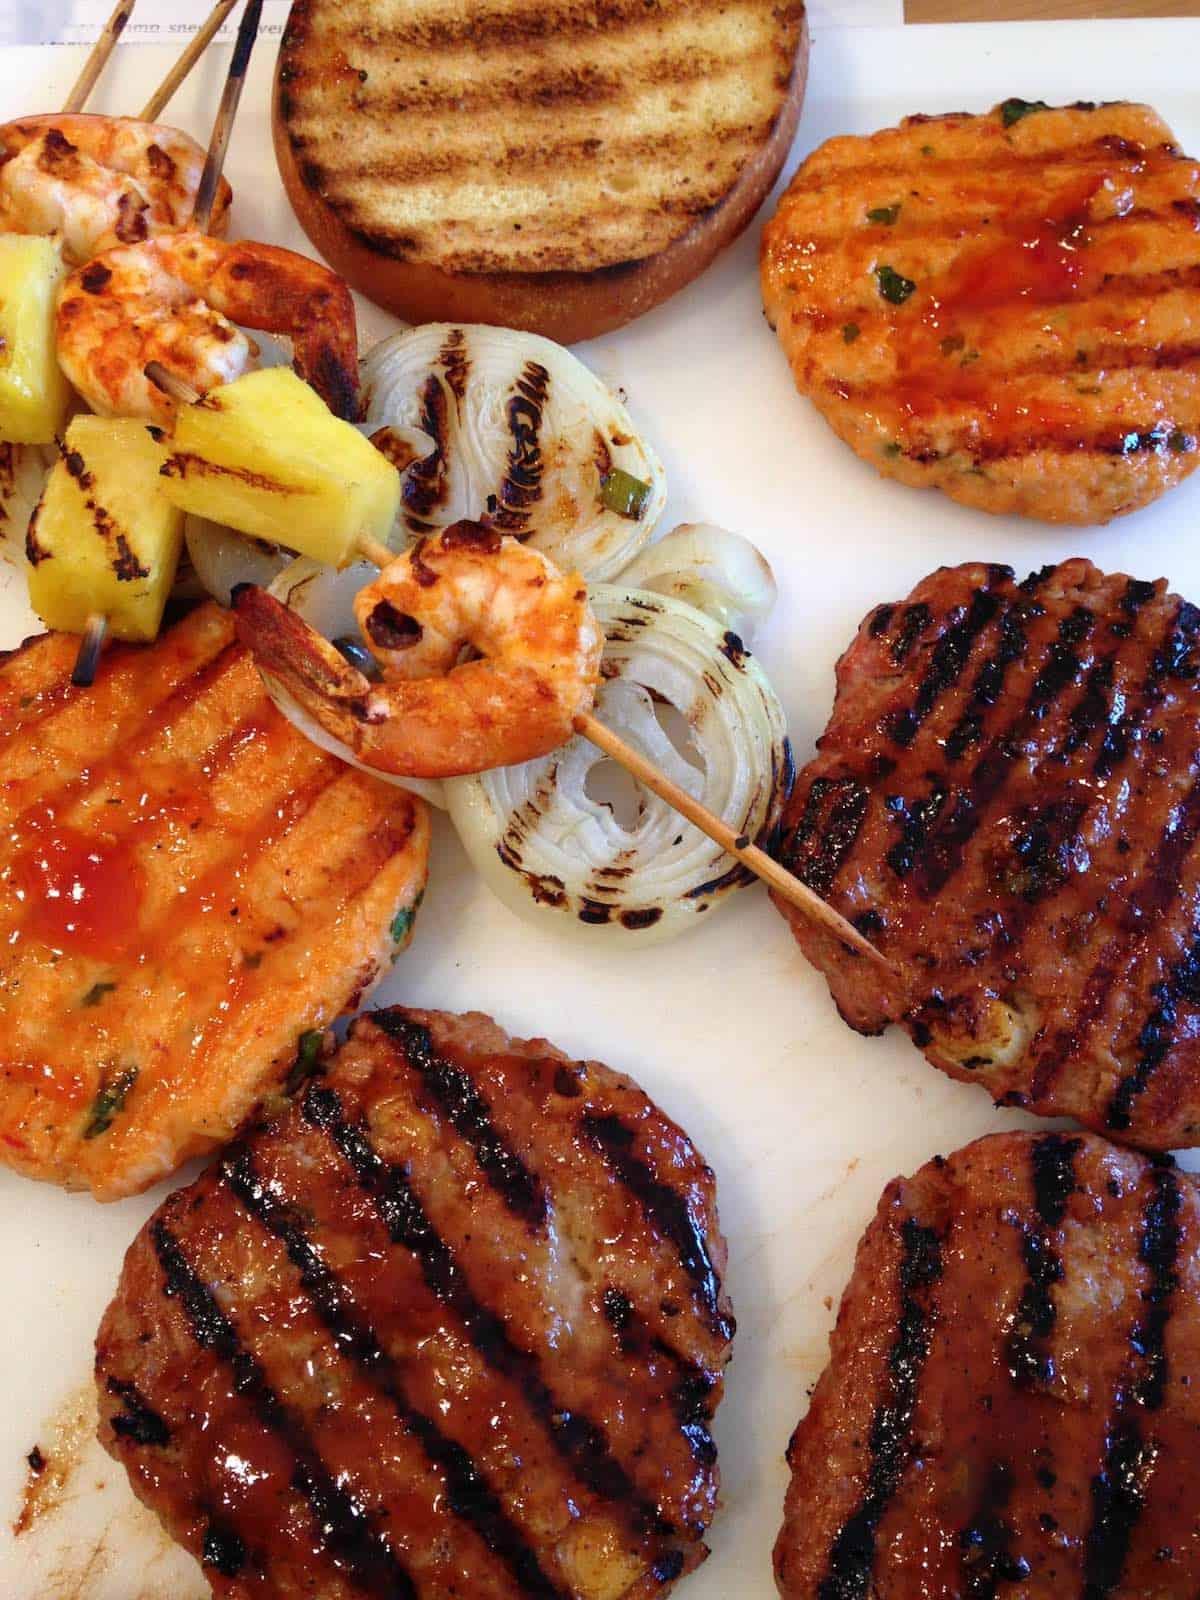 glazed burgers and shrimp, onions, pineapple